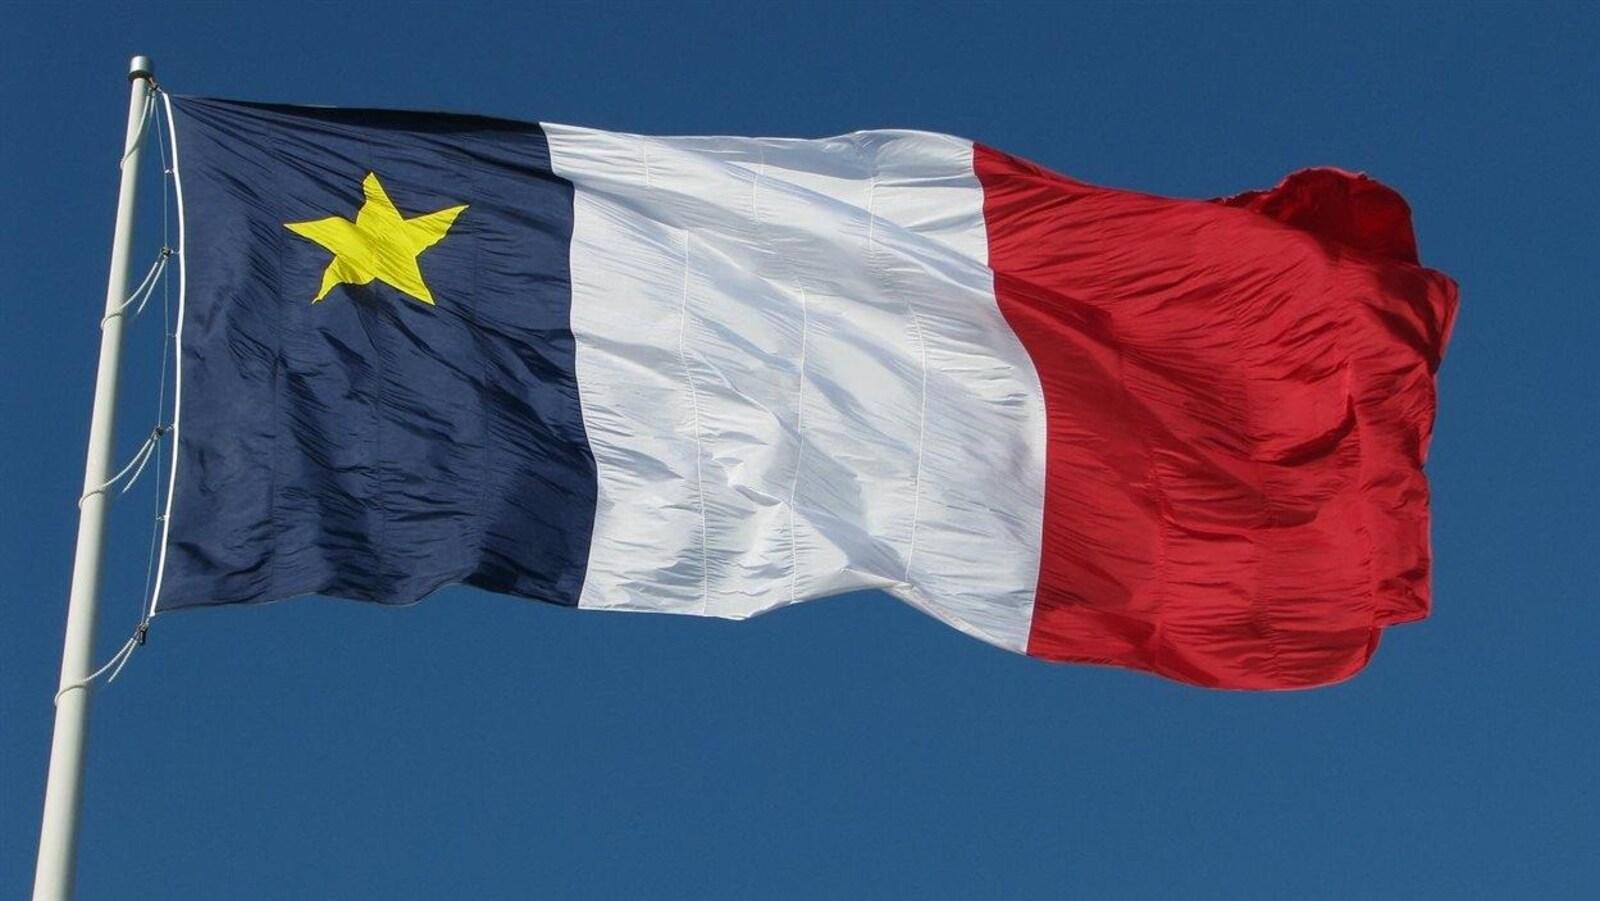 Le drapeau acadien